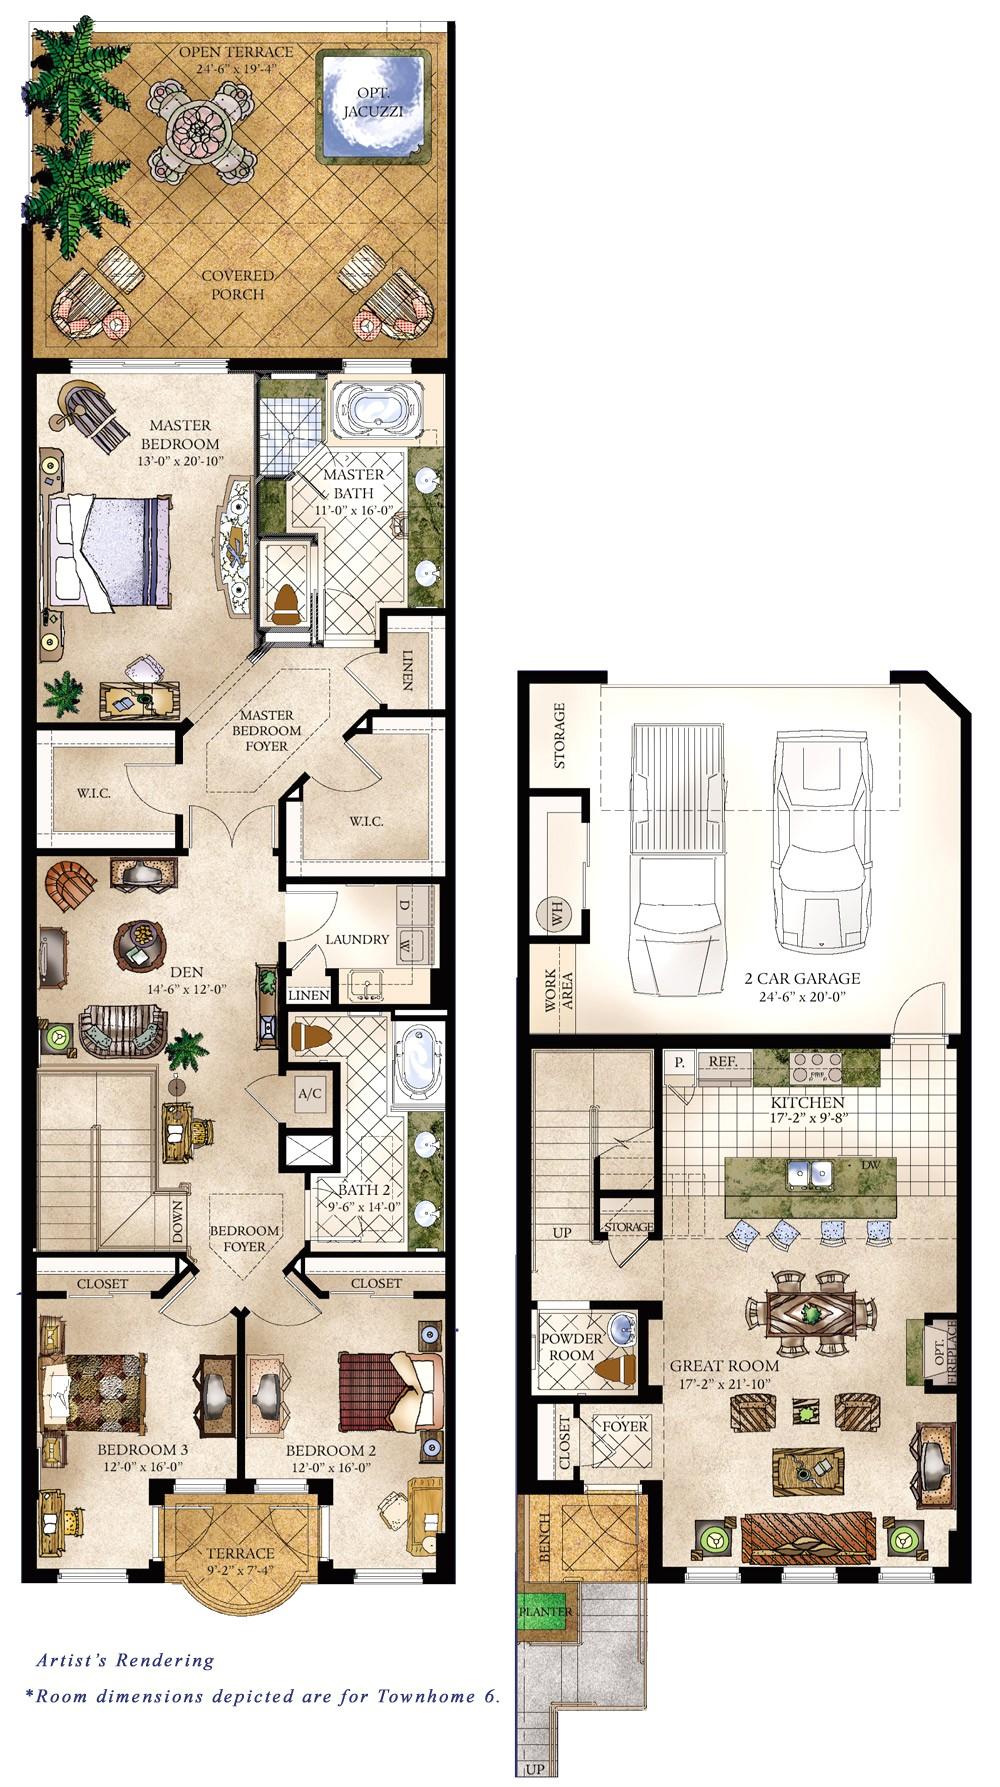 Town Home Floor Plans townhomes Floorplans Floor Plans